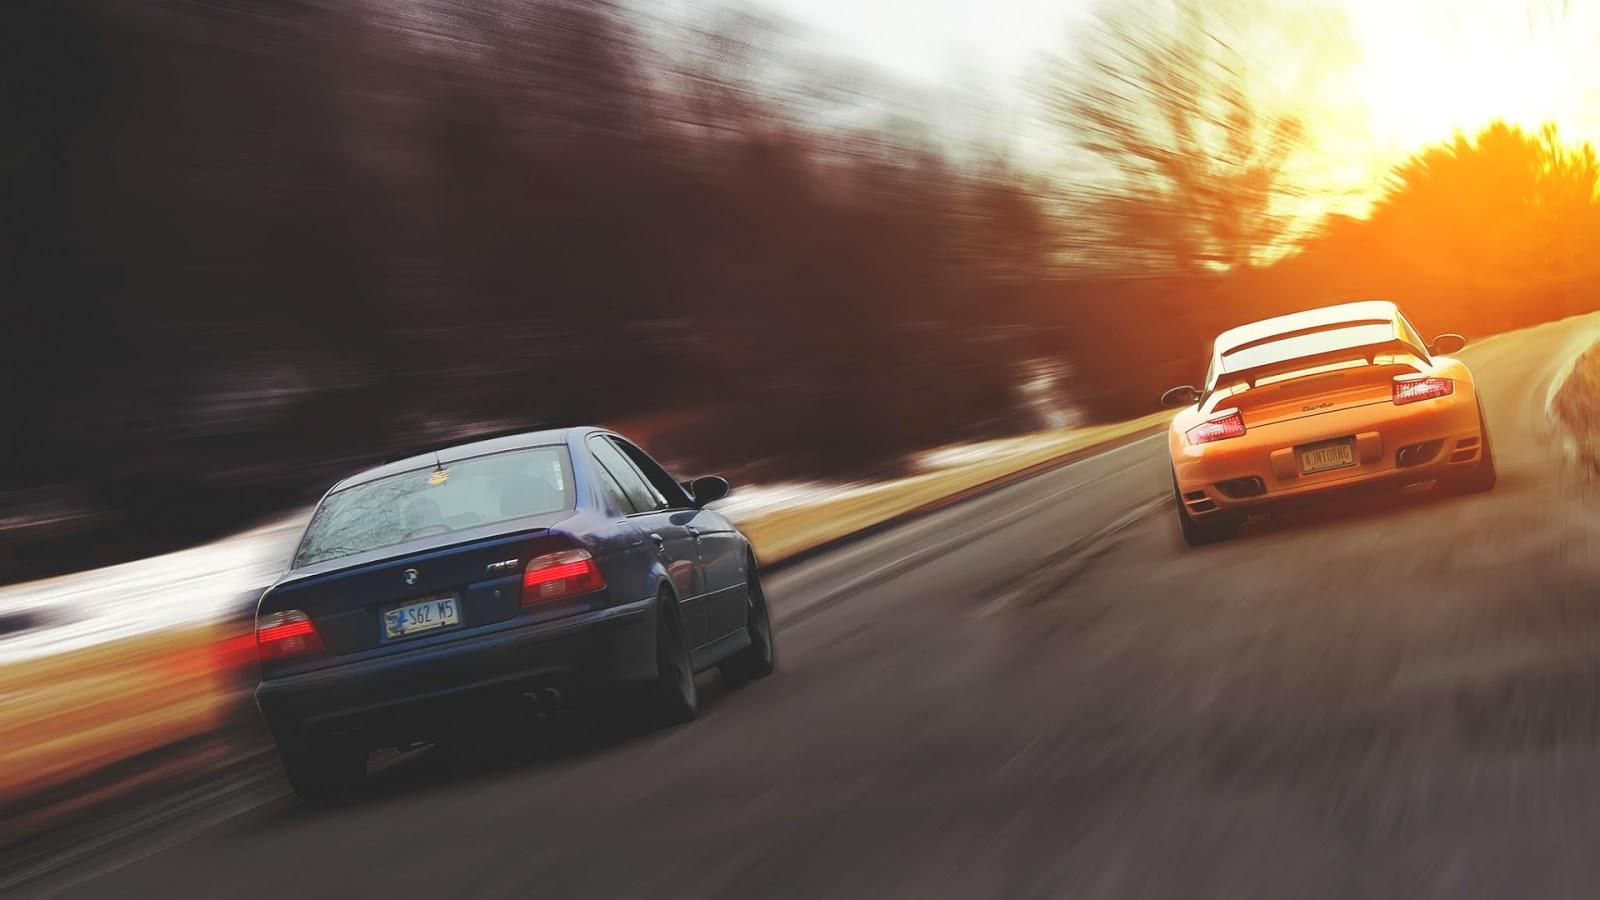 Fondos De Pantalla Hd De Autos: Imagenes De Autos Modificados: Wallpaper HD De Carros